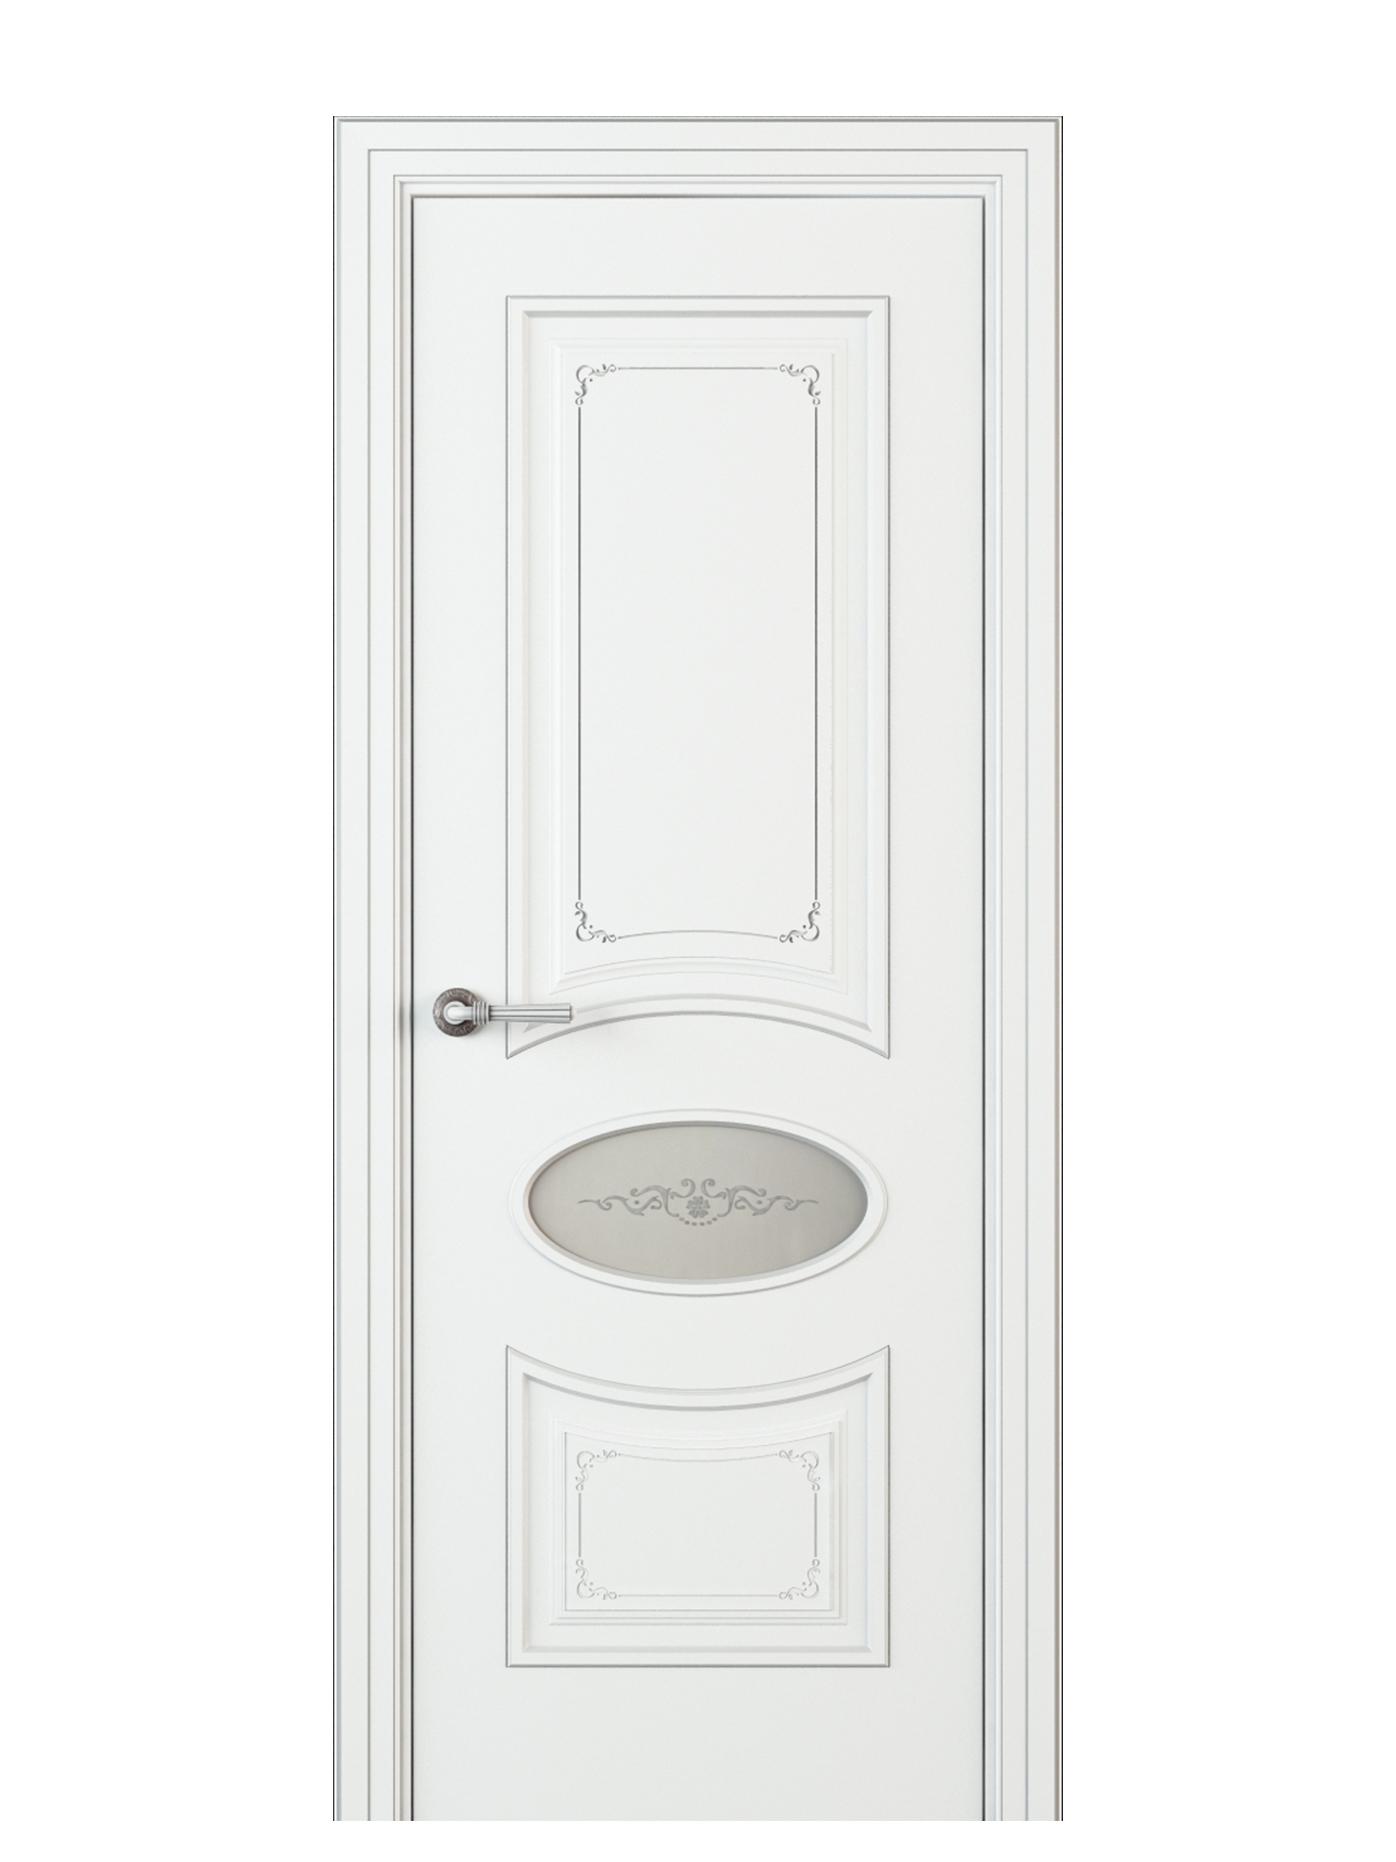 Image Amelia Incerto Interior Door Italian Enamel White 0